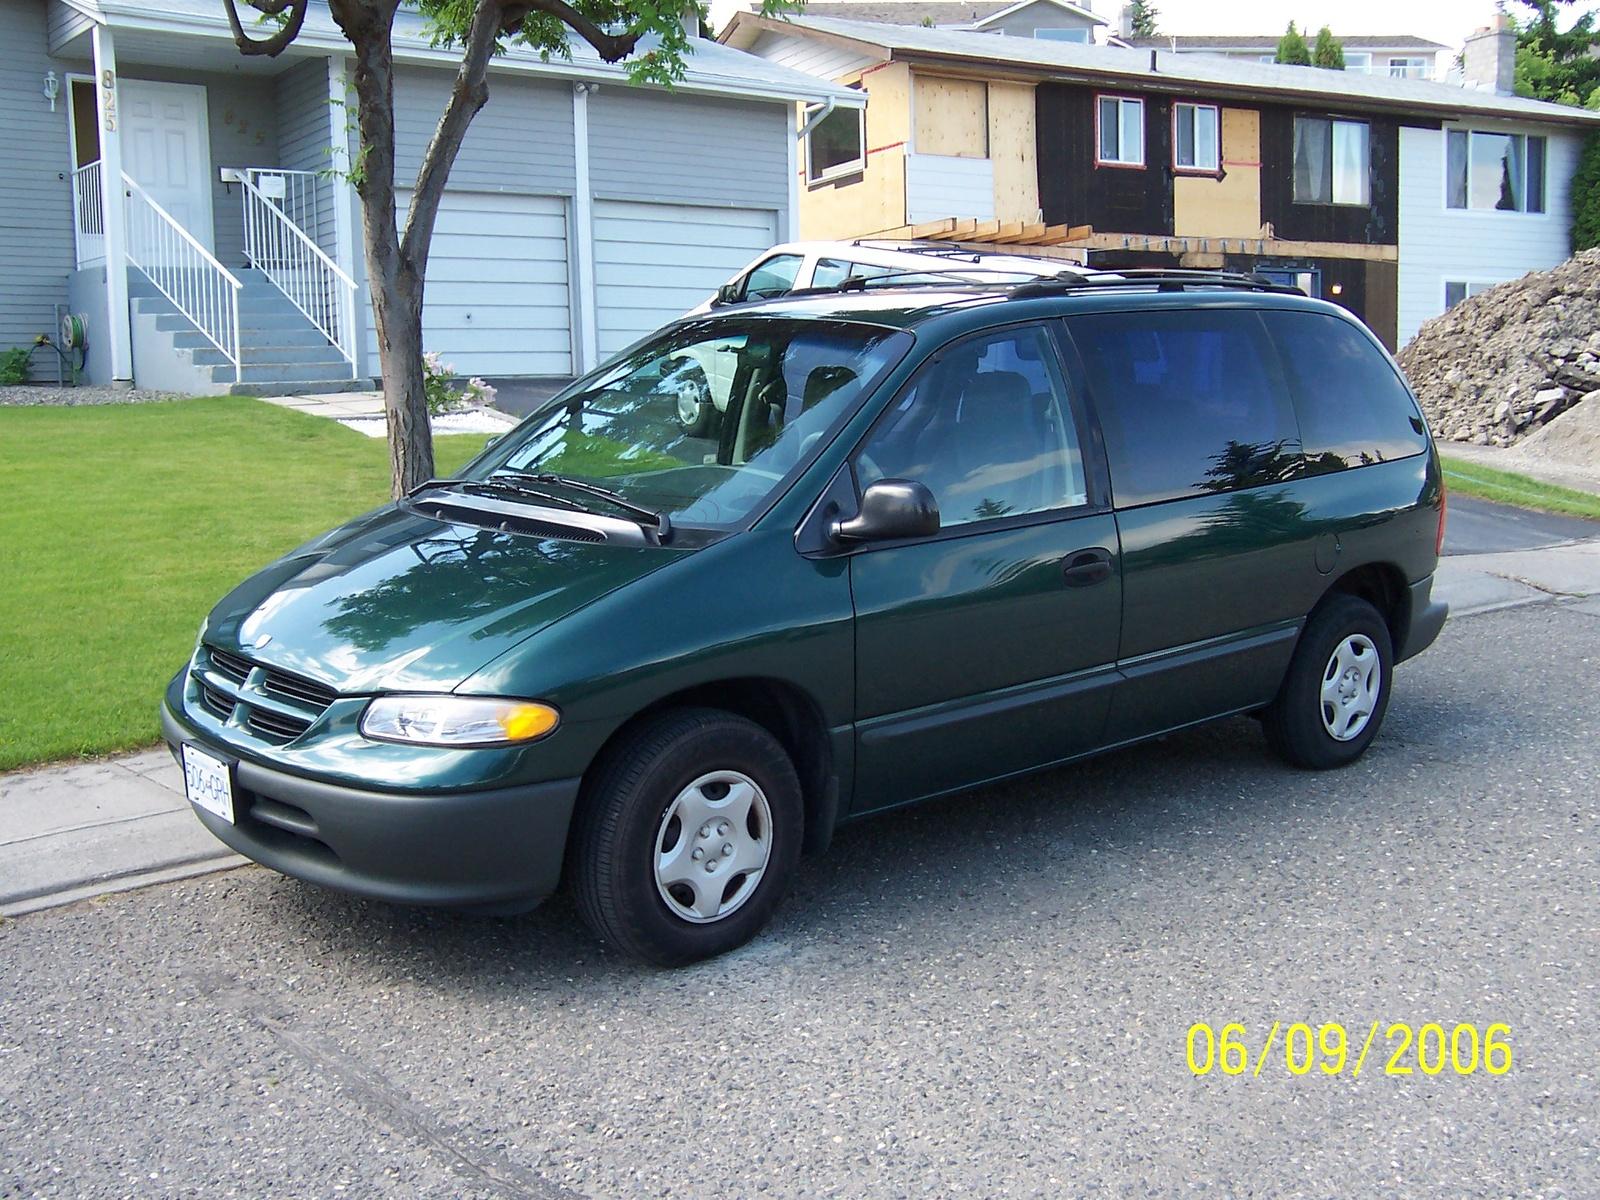 1997 Dodge Caravan Pictures Cargurus